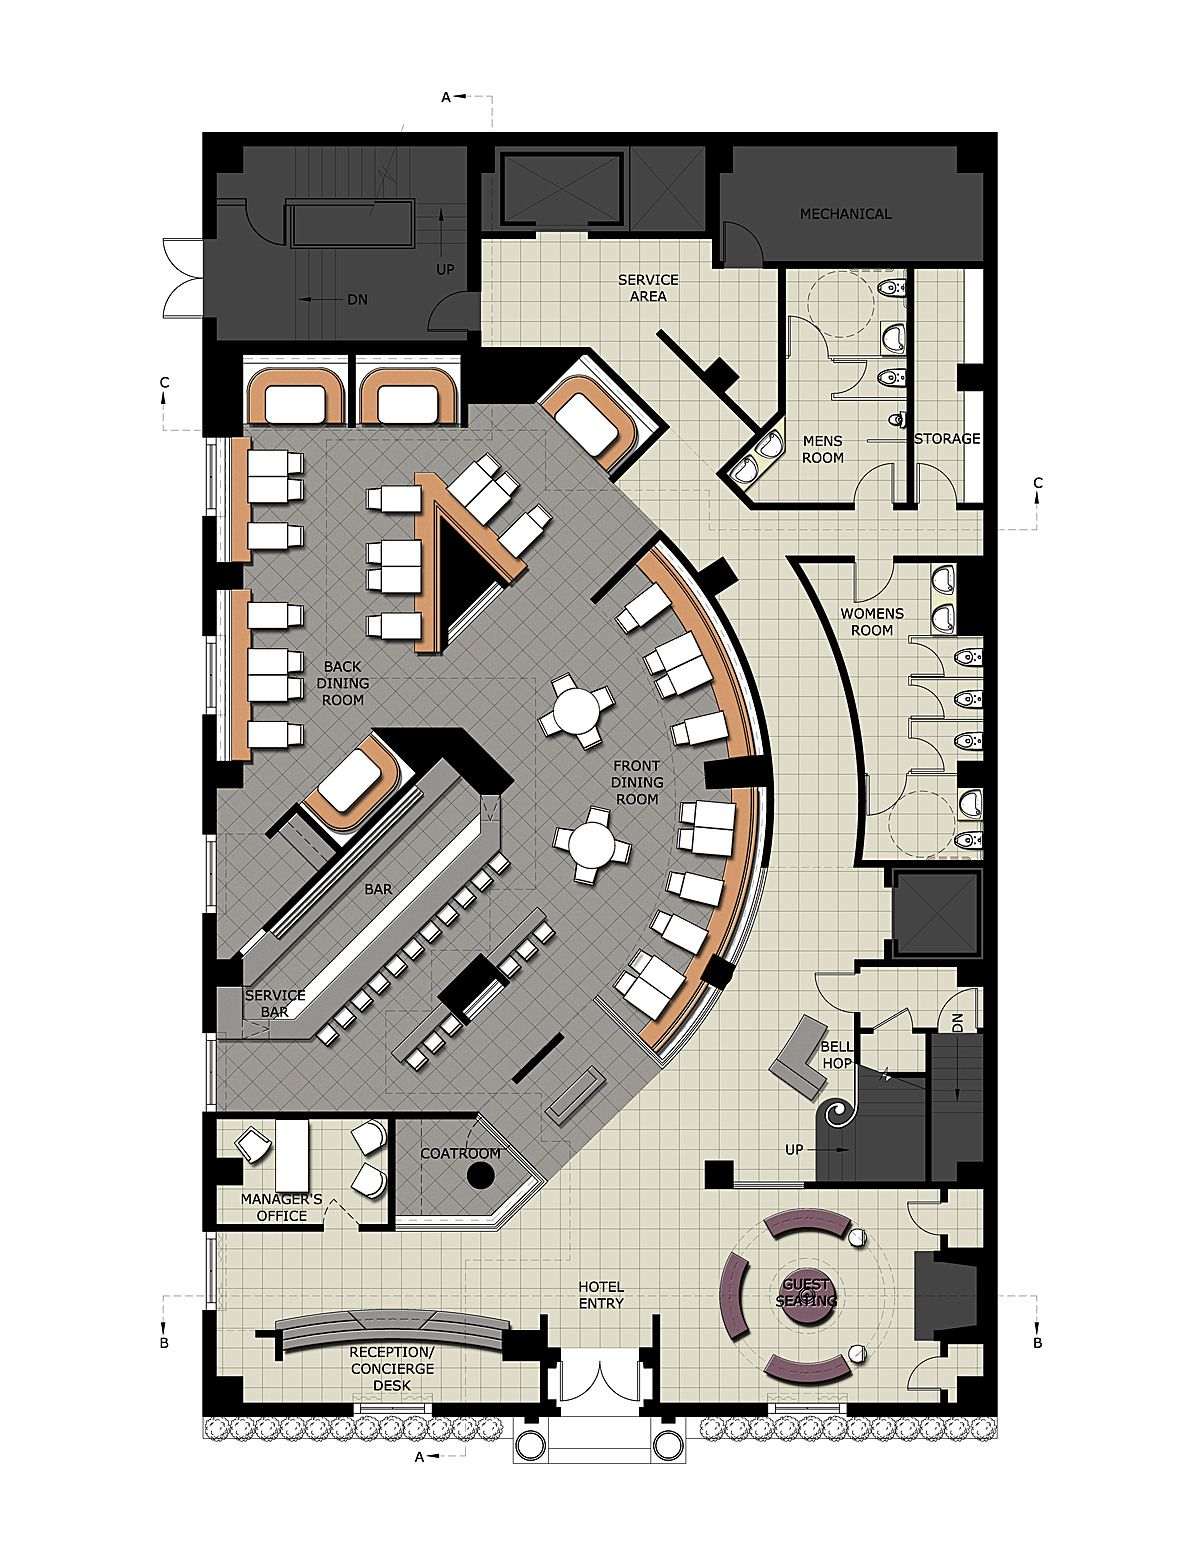 Hospitality Design Sara Audrey Small Archinect Restaurant Architecture Restaurant Plan Restaurant Floor Plan